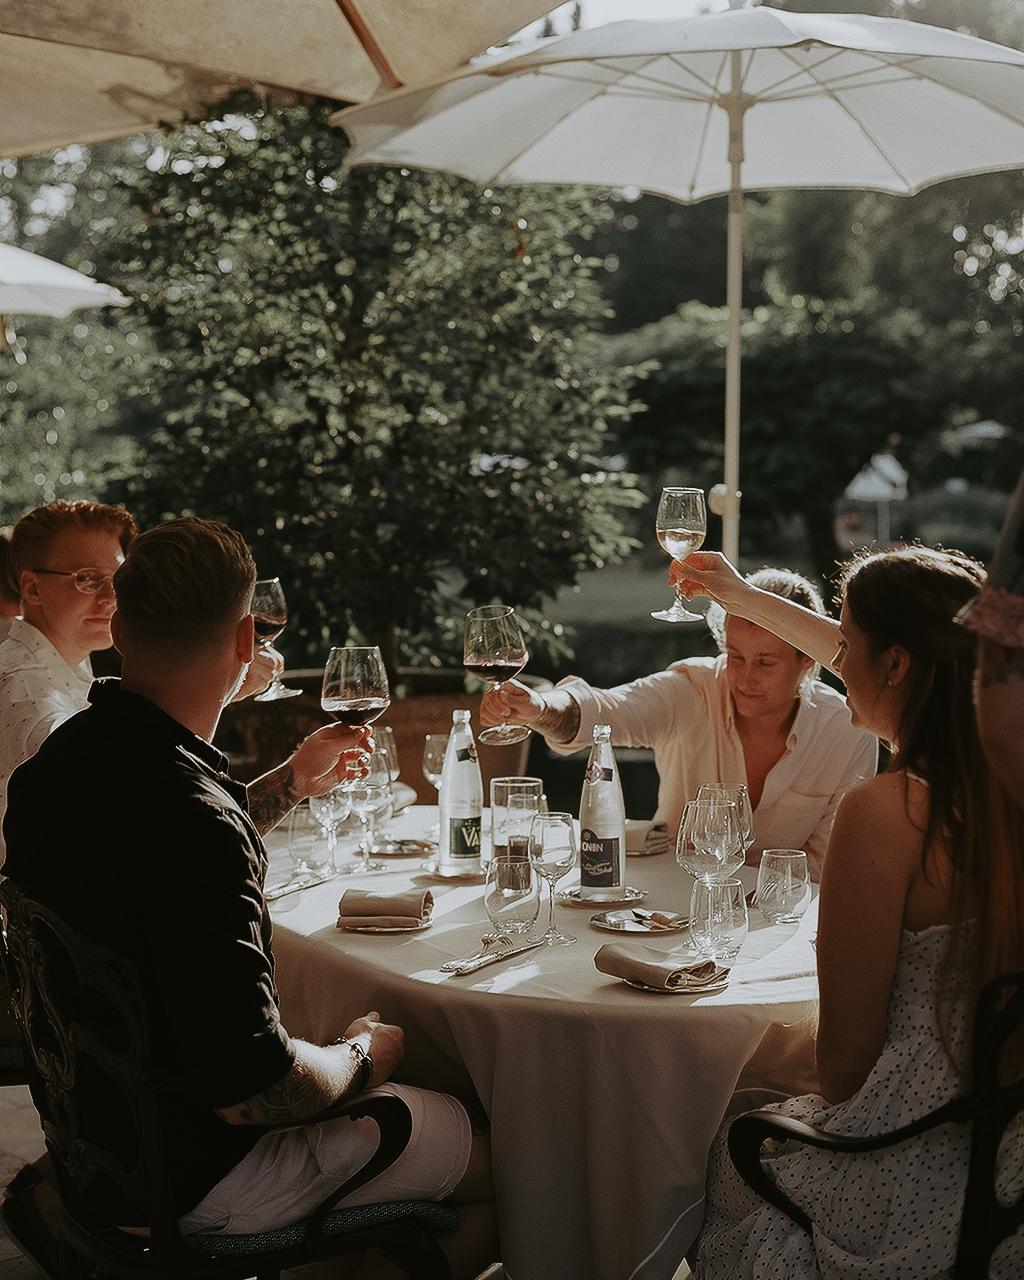 Wedding Celebrations - Film scans/wedding photography